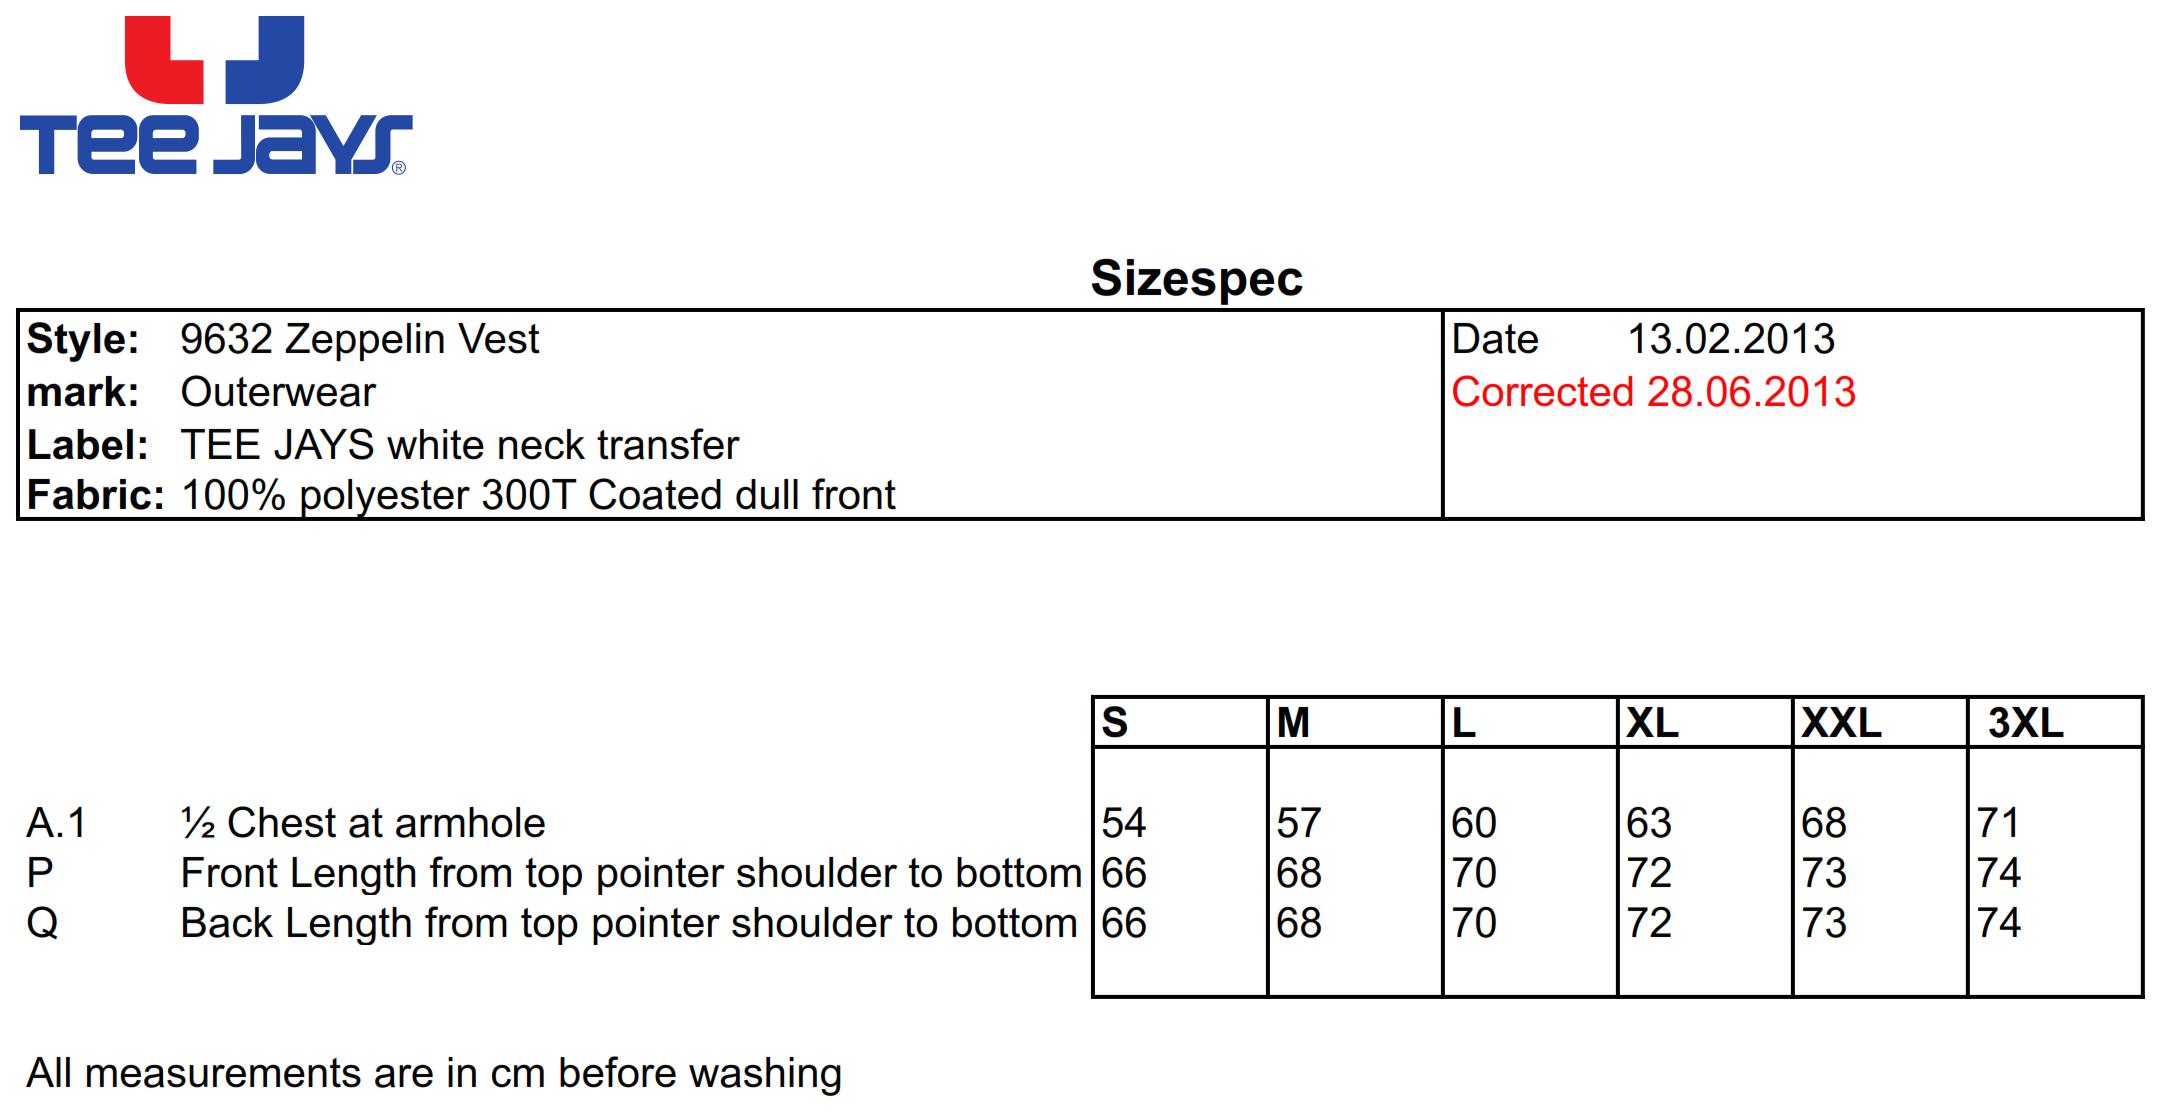 Tee Jays: Zepelin Vest 9632